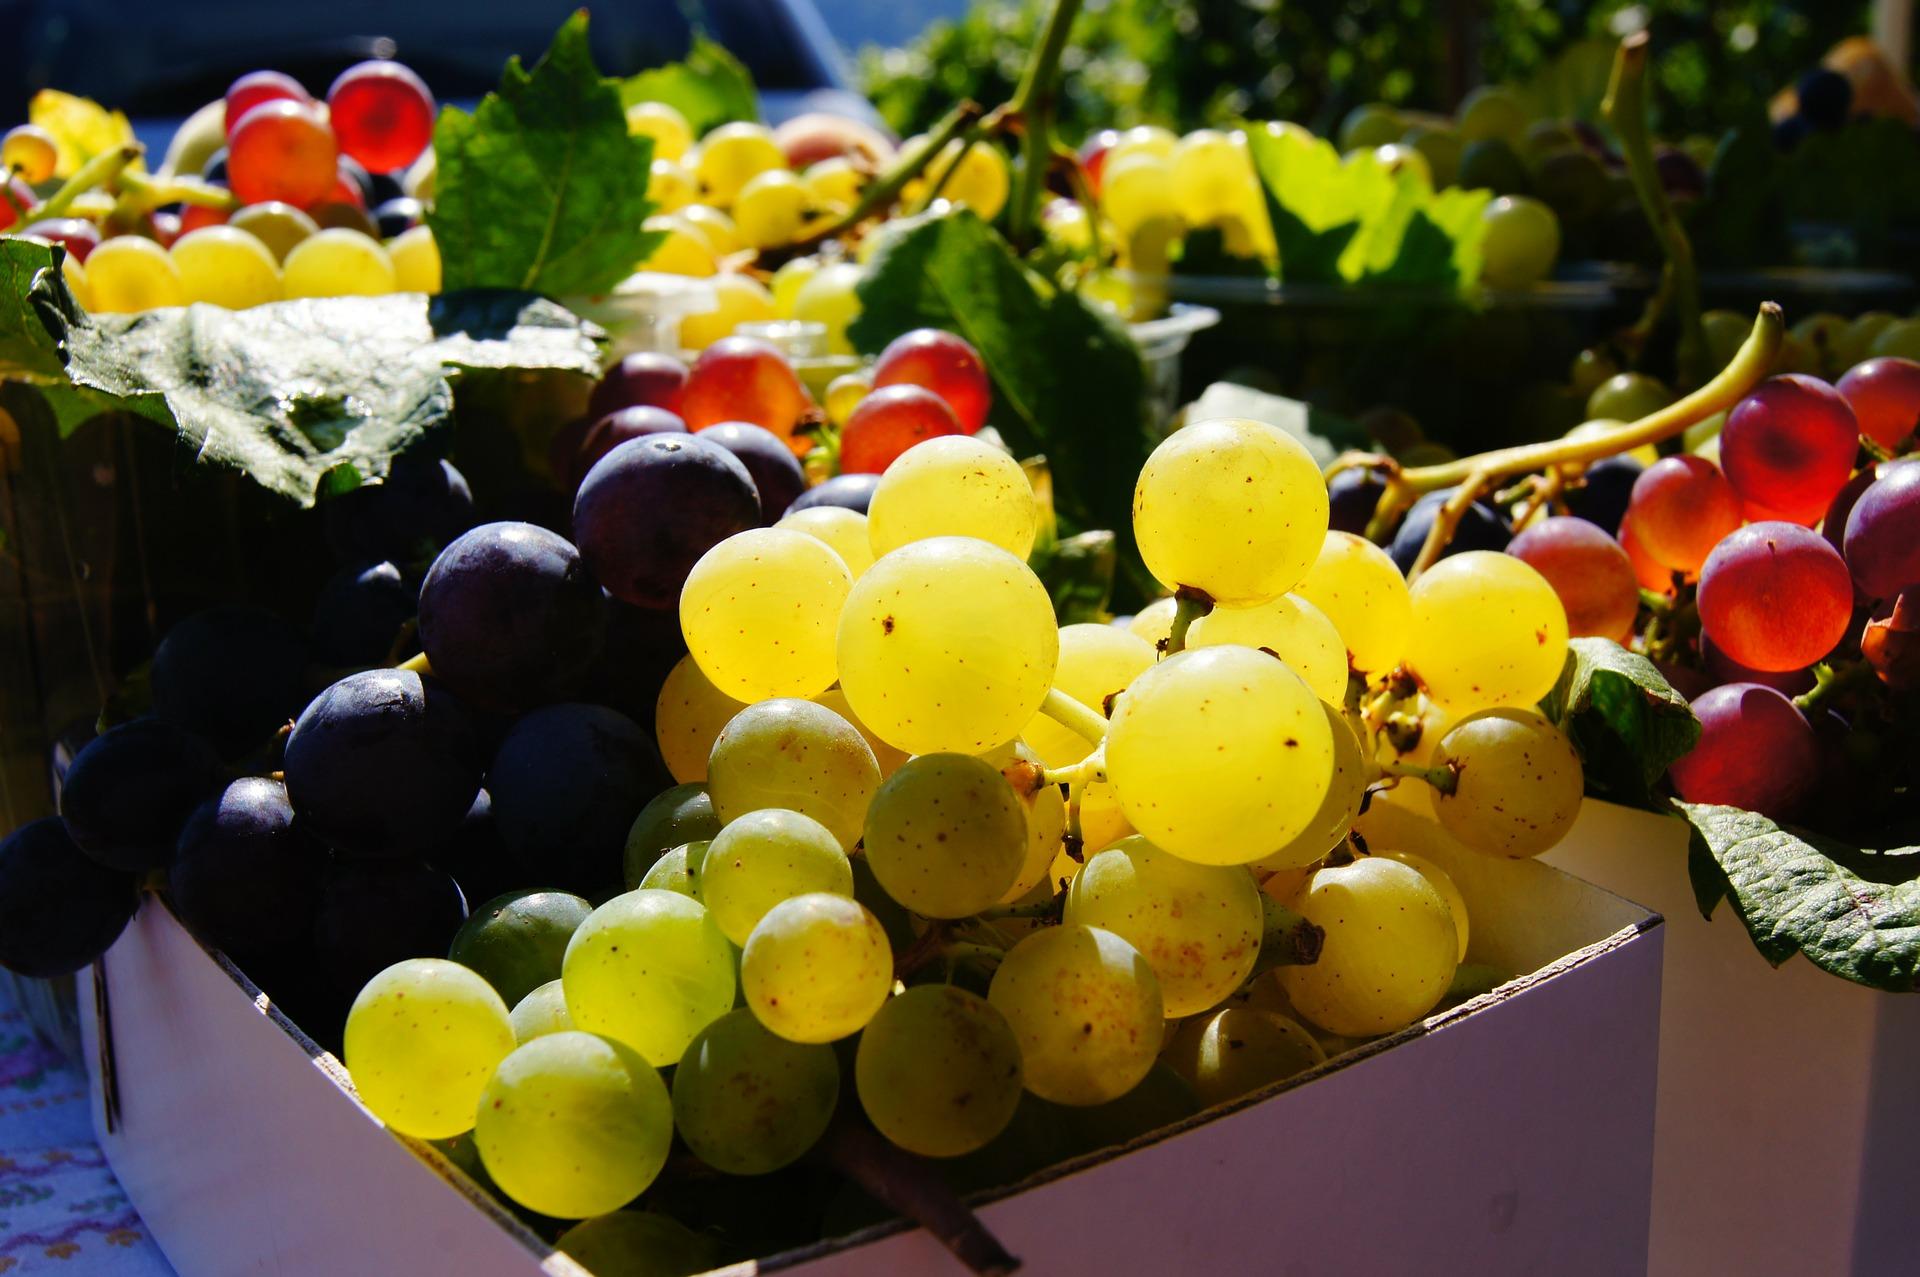 grapes-180118_1920.jpg